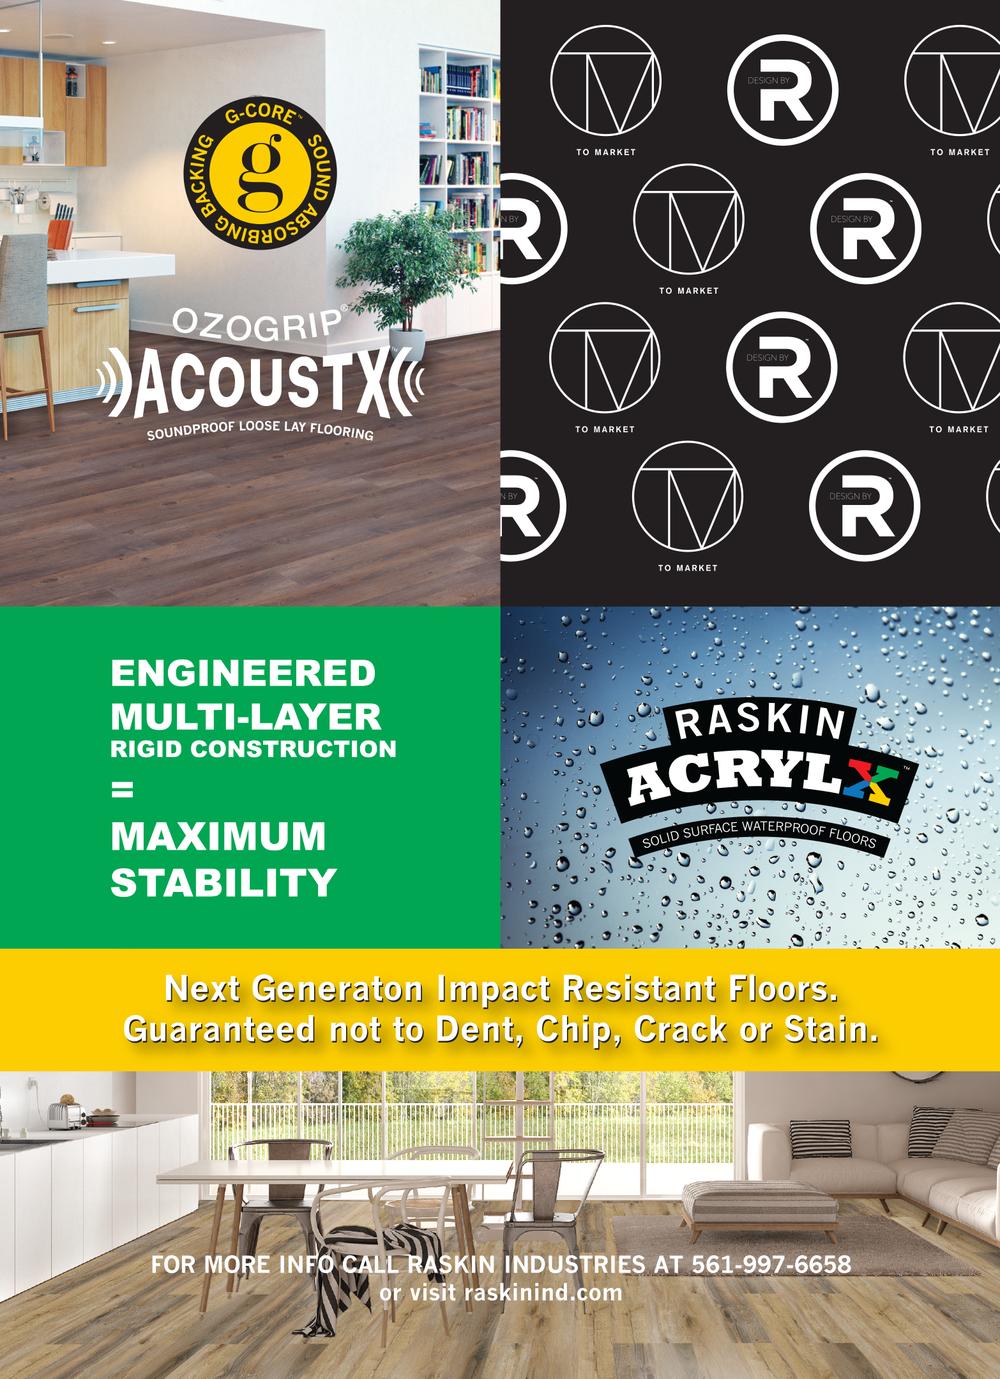 RaskinTomarket-FCNews.png